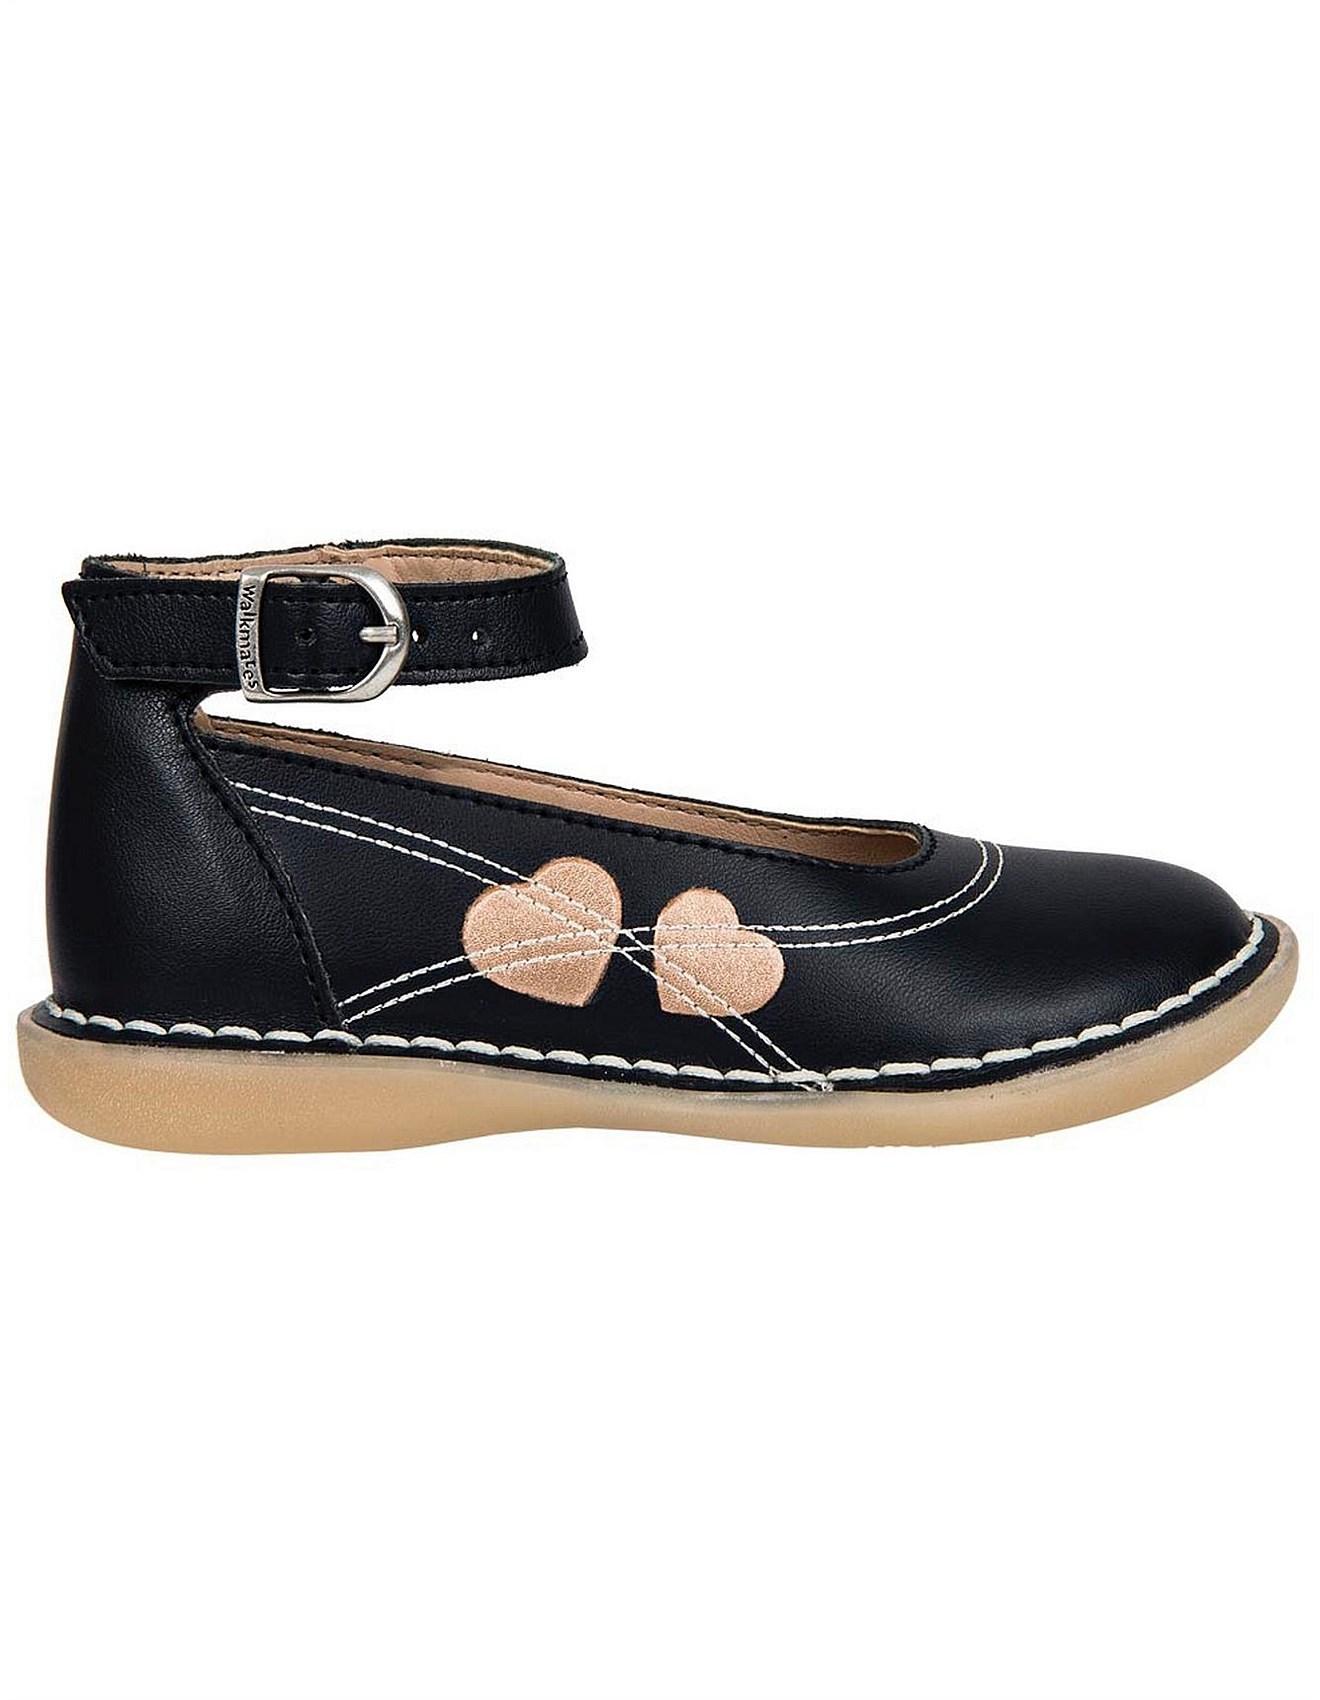 Kids Shoes | Shoes For Girls \u0026 Boys